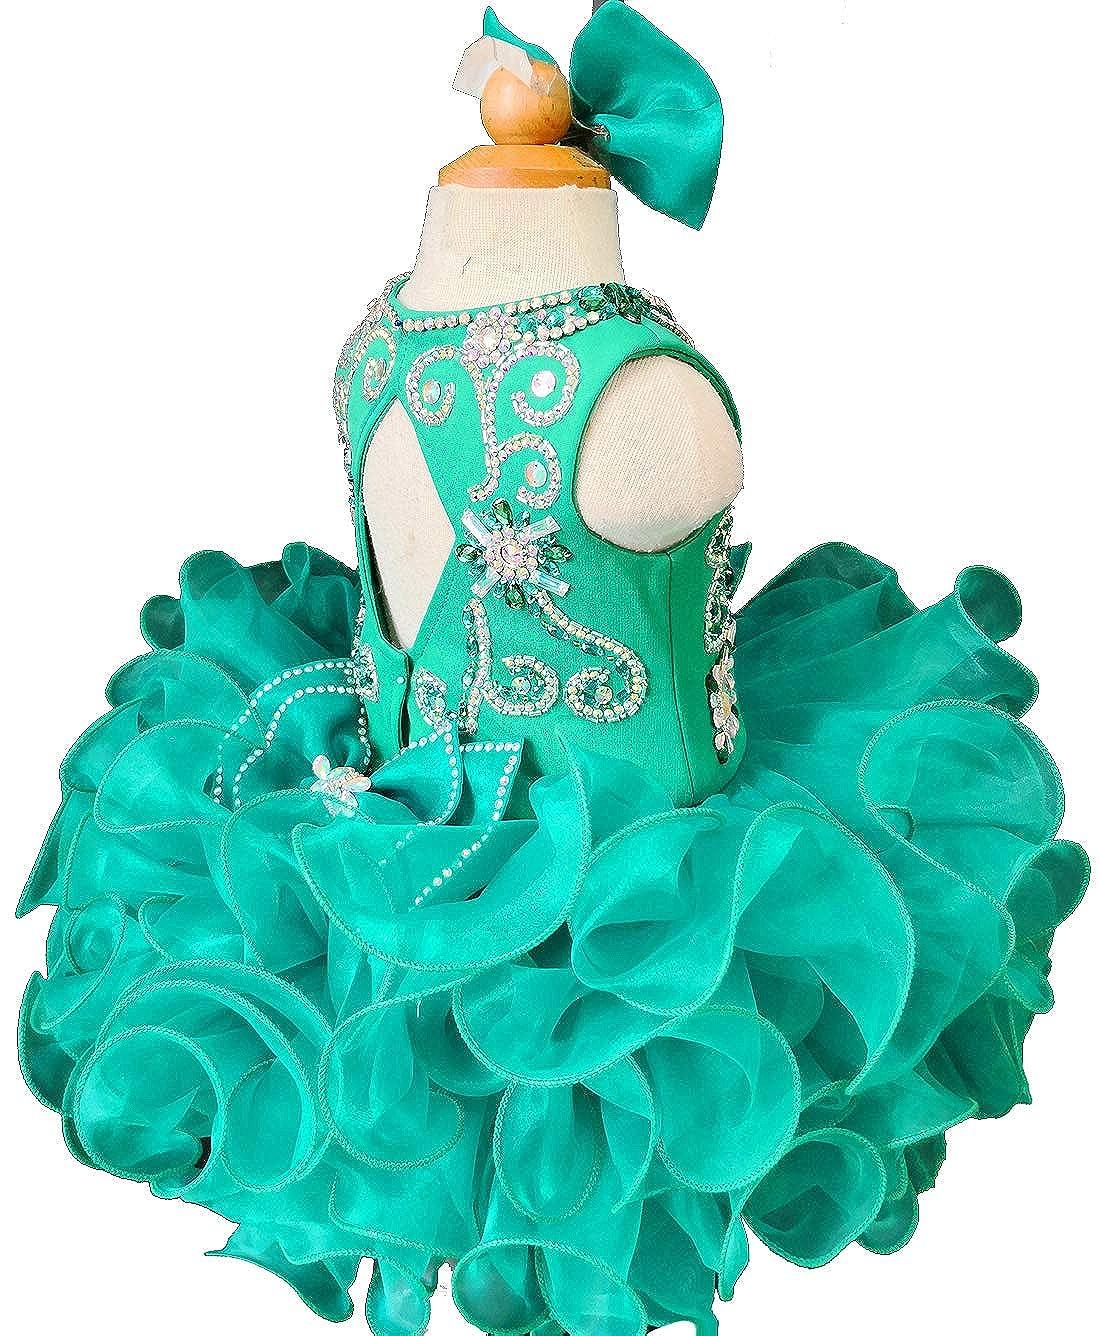 Jenniferwu Infant Toddler Baby Newborn Little Girls Pageant Party Birthday Dress G090 Emerald Size 3T